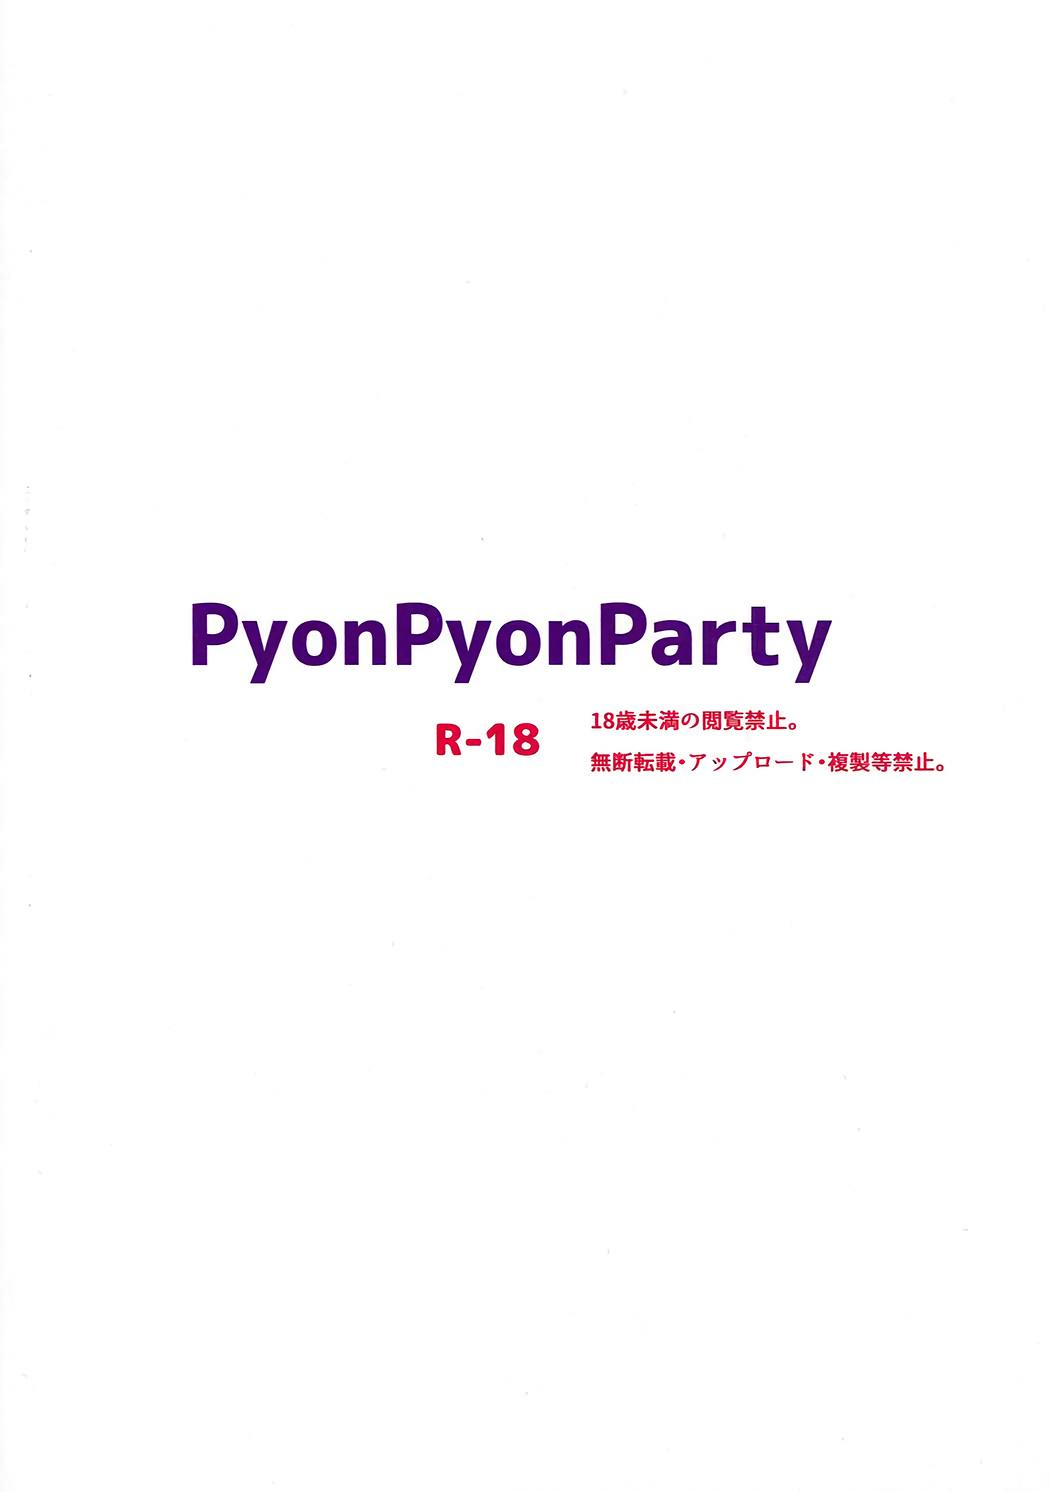 PyonPyonParty 13